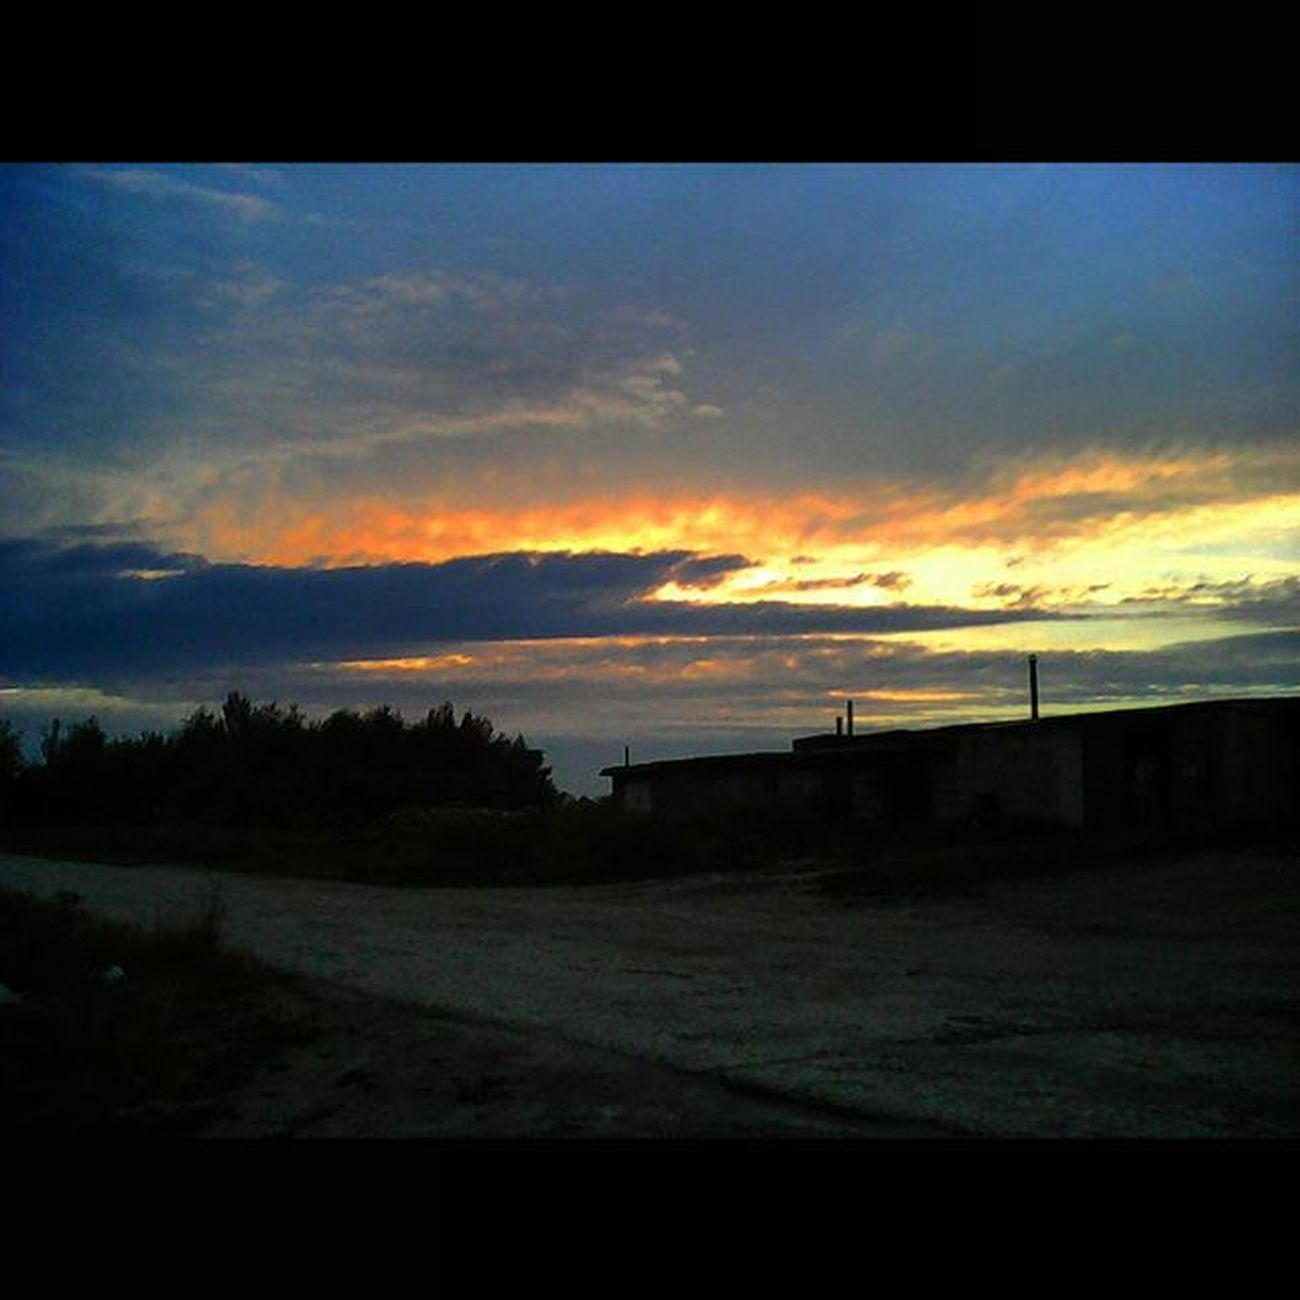 Закат АУНасНеВоДворе Sunset BeautyfulSunset SquareInstaPic ПоДорогеСОблаками ПоДорогеСОблаками☁☁☁☁☁☁☁ ☁